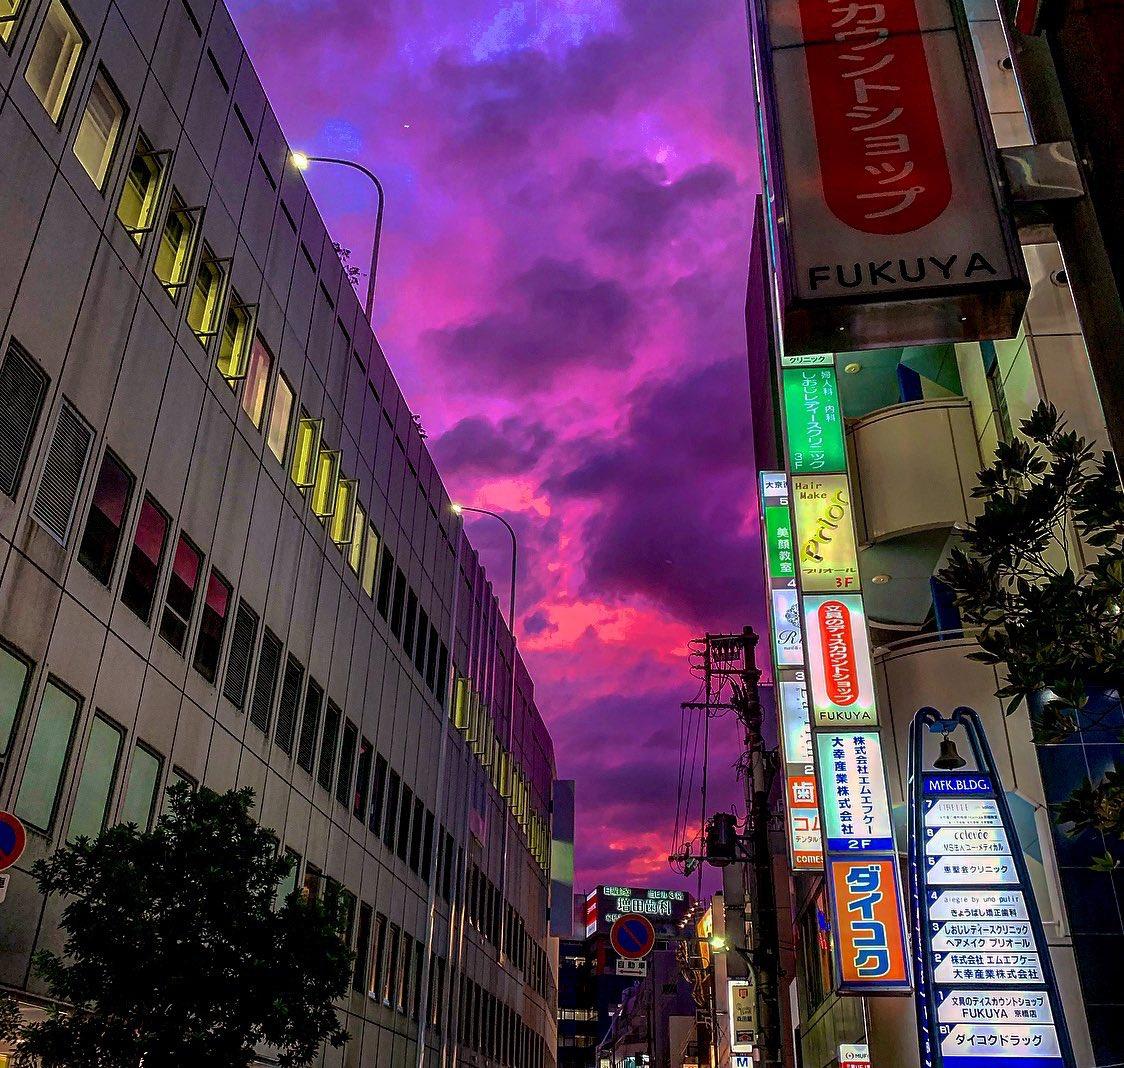 Sudut kota Tokyo, langit berwarna ungu.